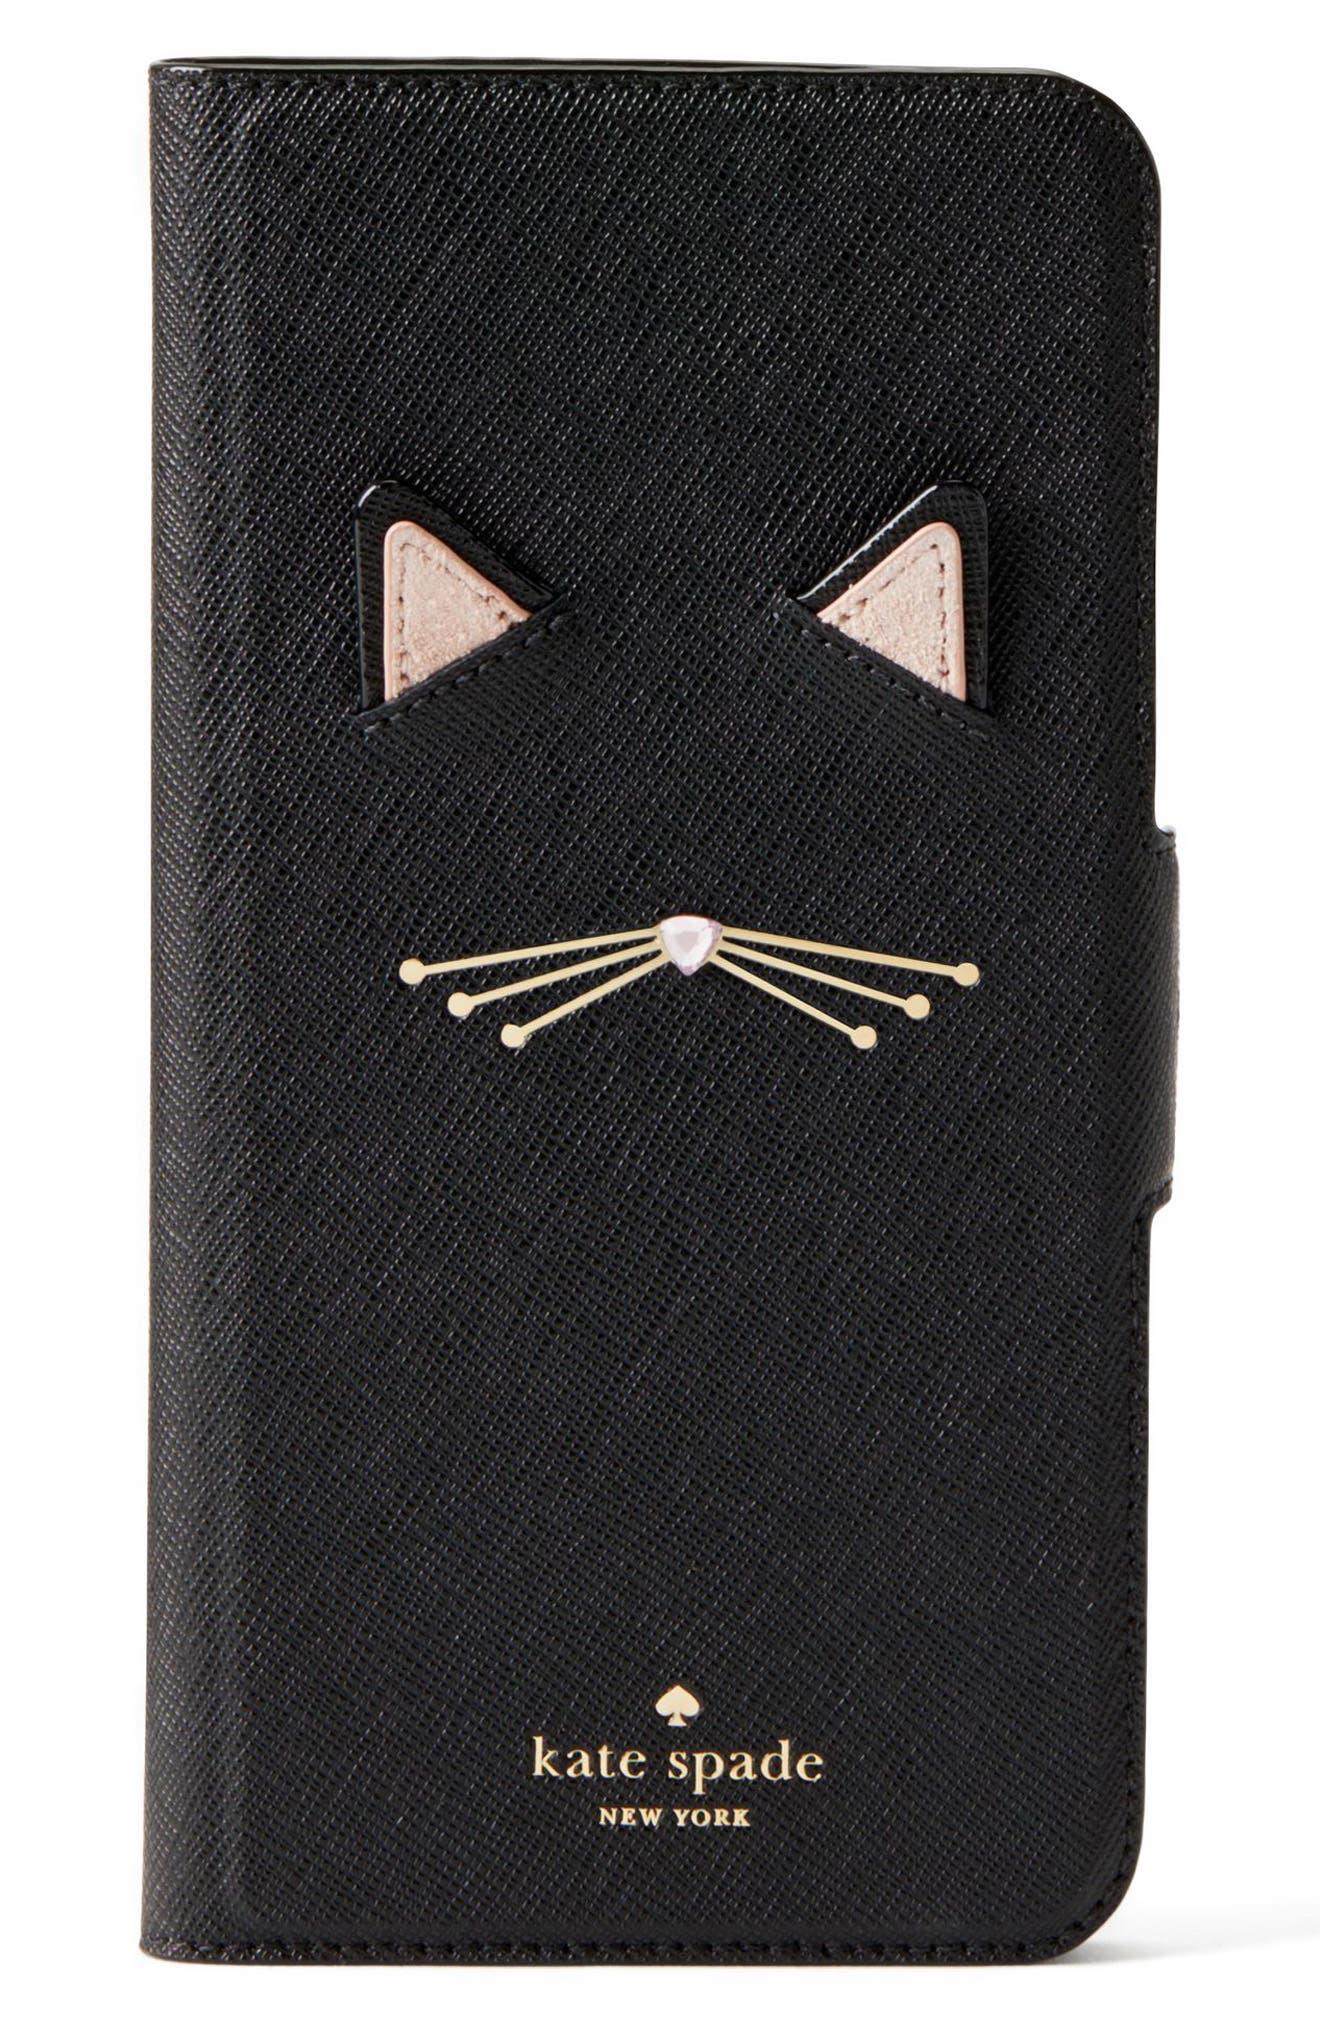 KATE SPADE NEW YORK cat appliqué iPhone 7/8 & 7/8 Plus folio case, Main, color, 001